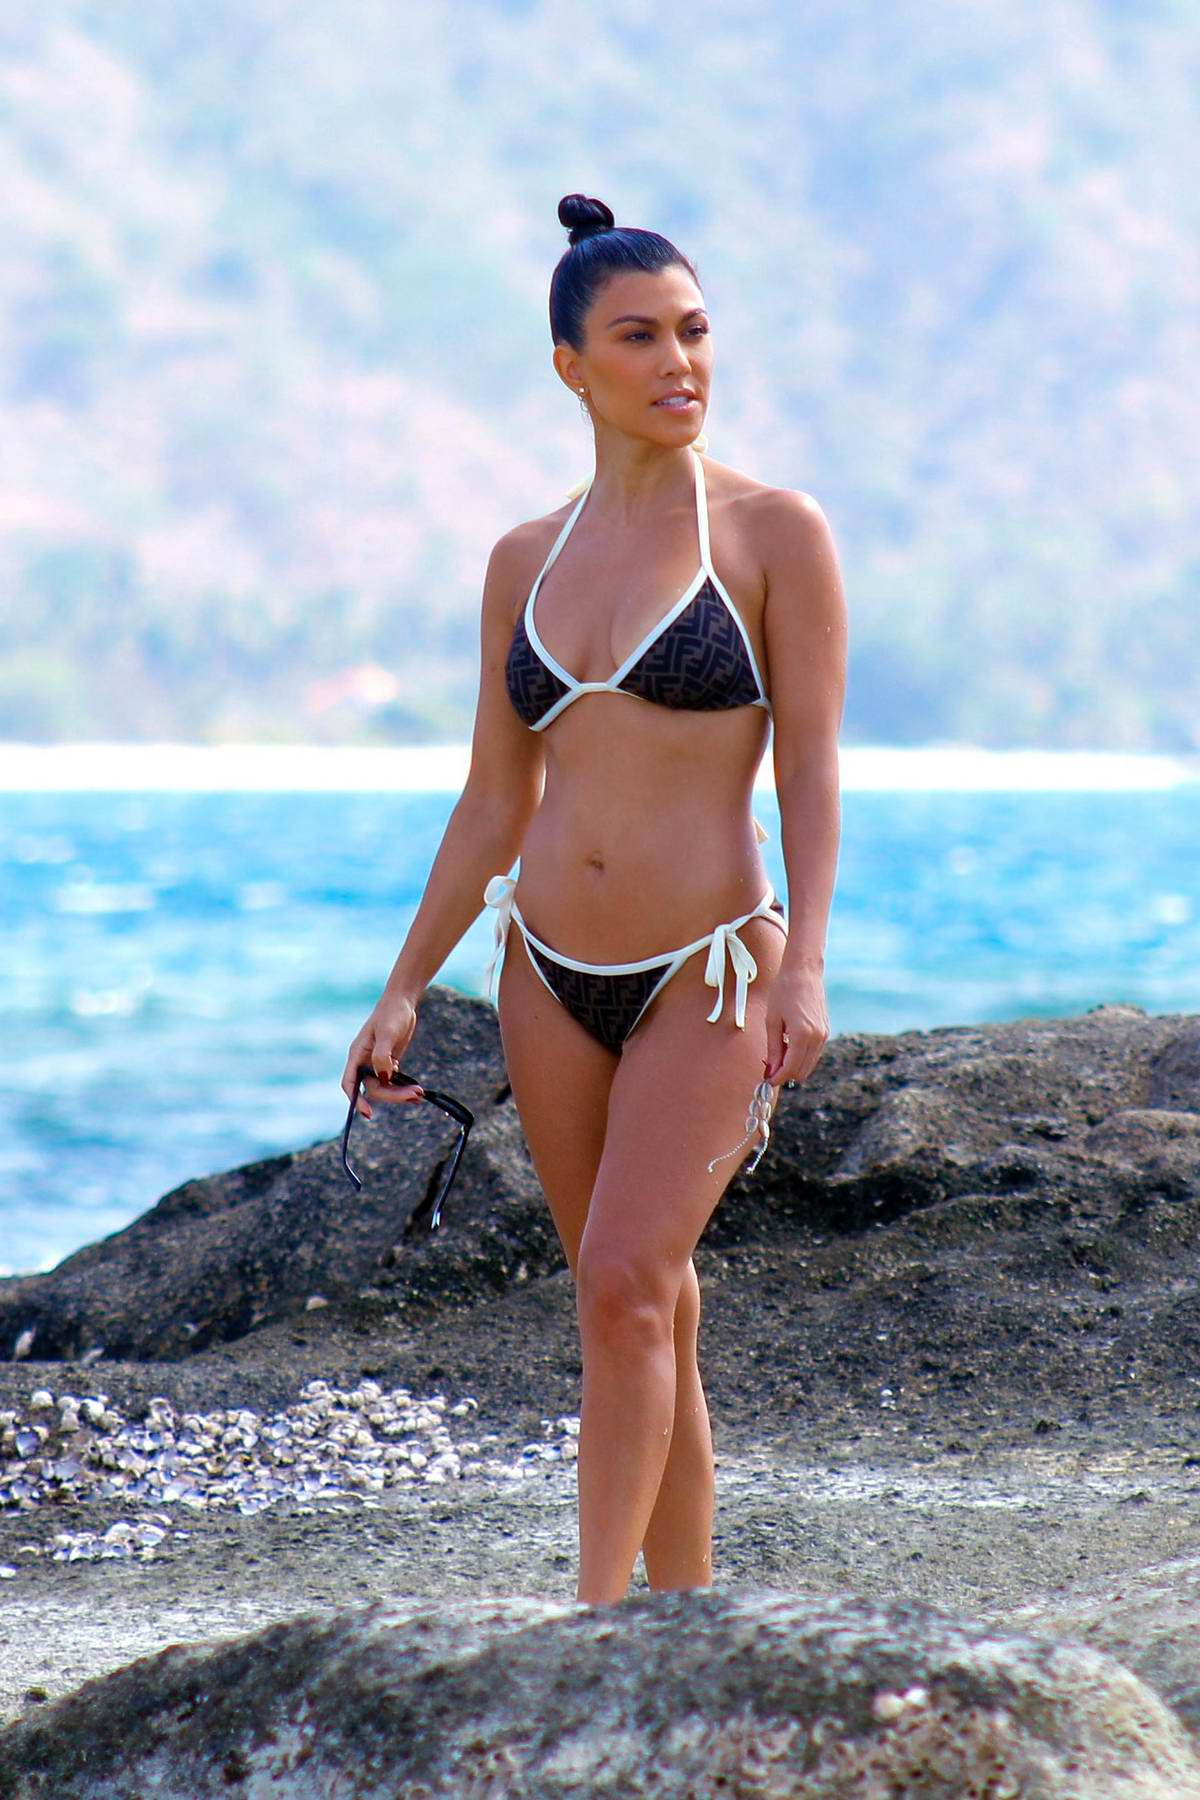 Kourtney Kardashian wears a Fendi bikini as she enjoys the beach in Bali, Indonesia